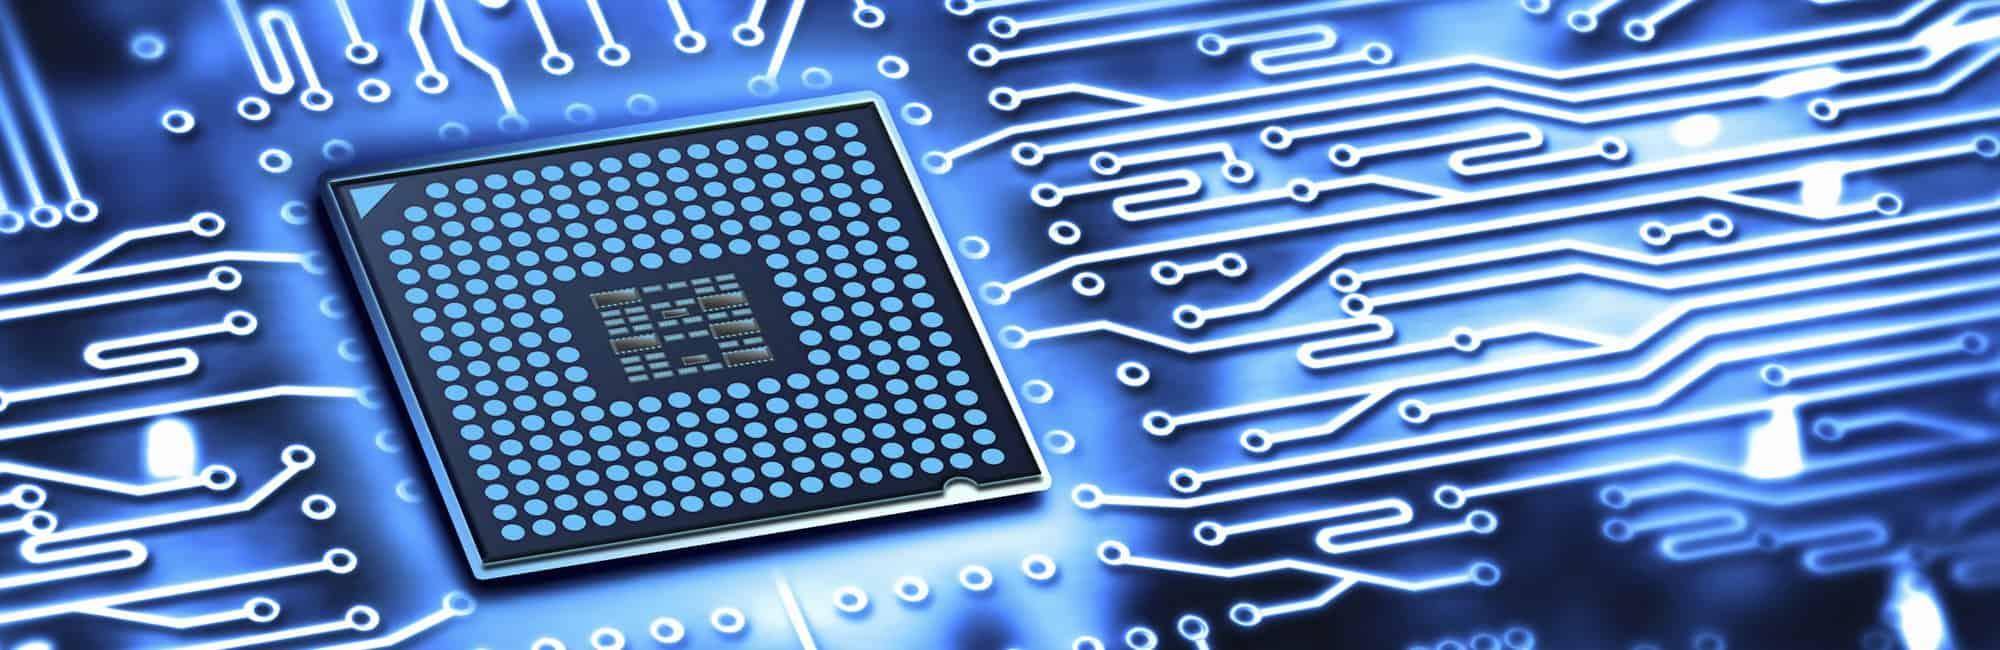 Electronics Design & Development